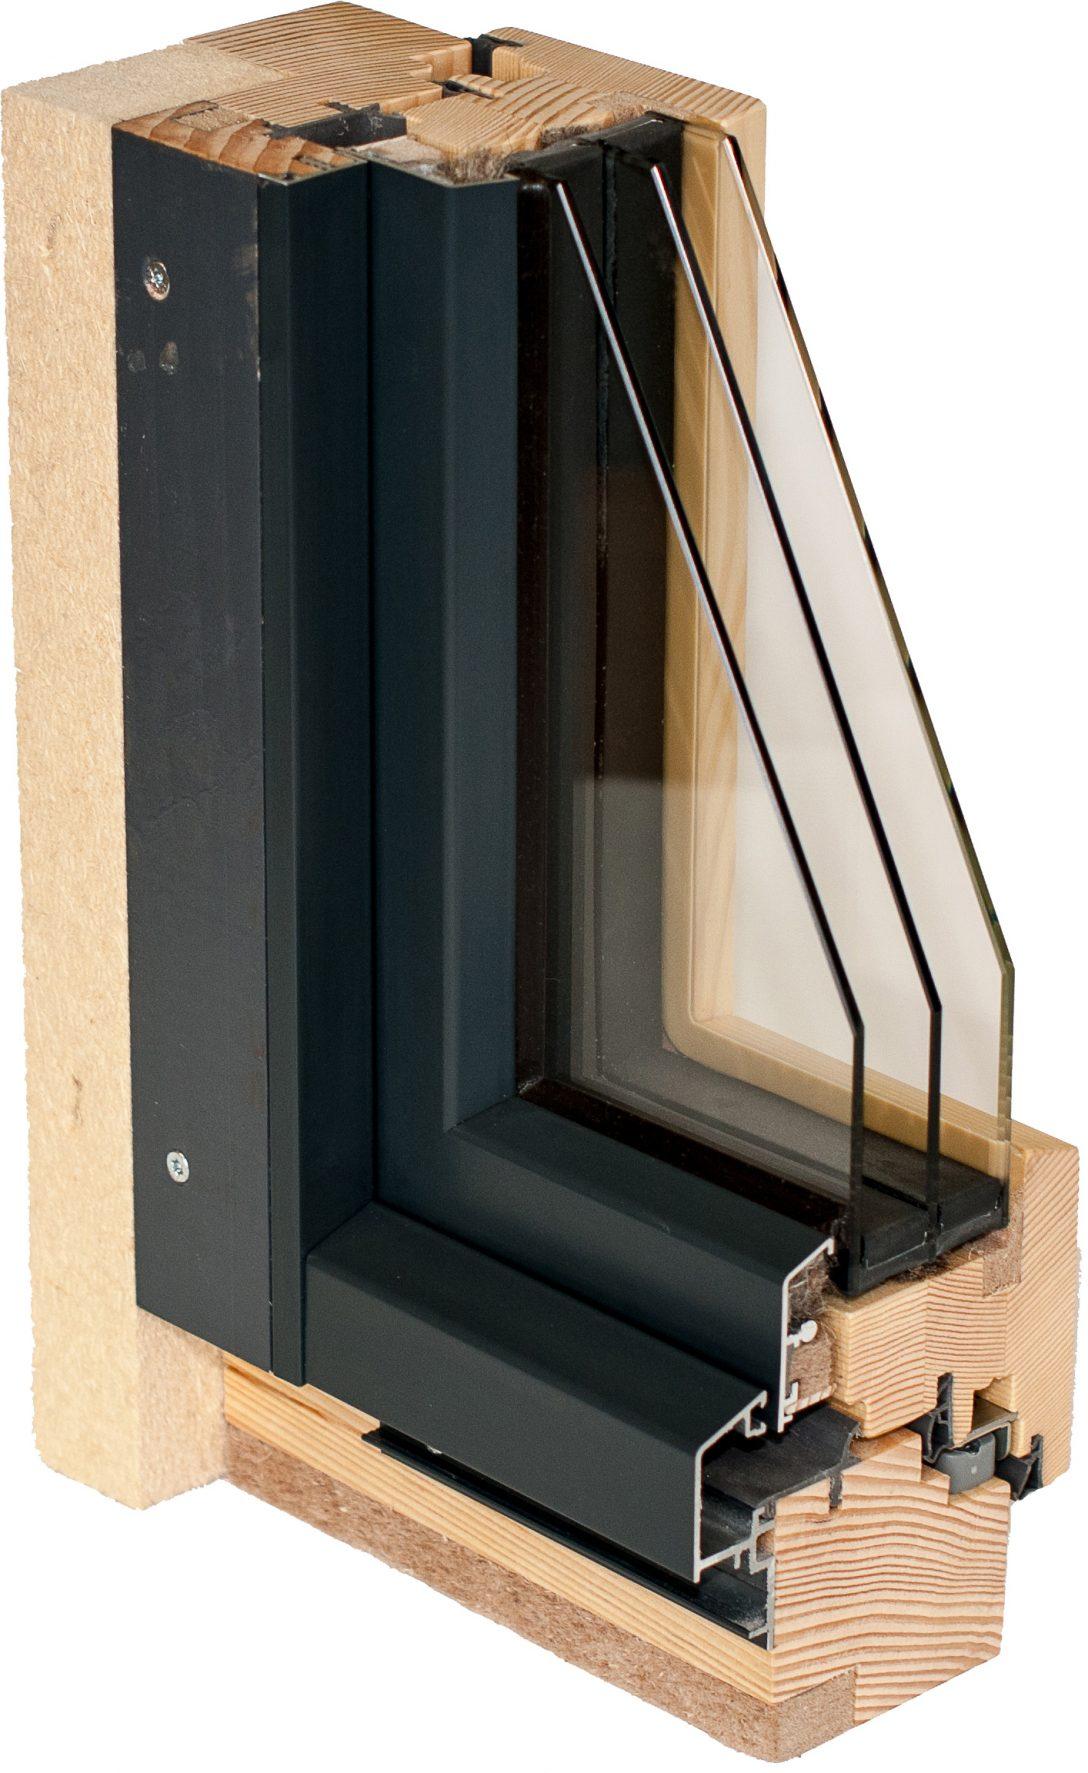 Large Size of Fenster Holz Alu Hersteller Kosten Pro Qm Preisvergleich Kunststoff Preise Online Oder Kunststofffenster Preisliste Josko Aluminium Kaufen Holz Aluminium Fenster Fenster Holz Alu